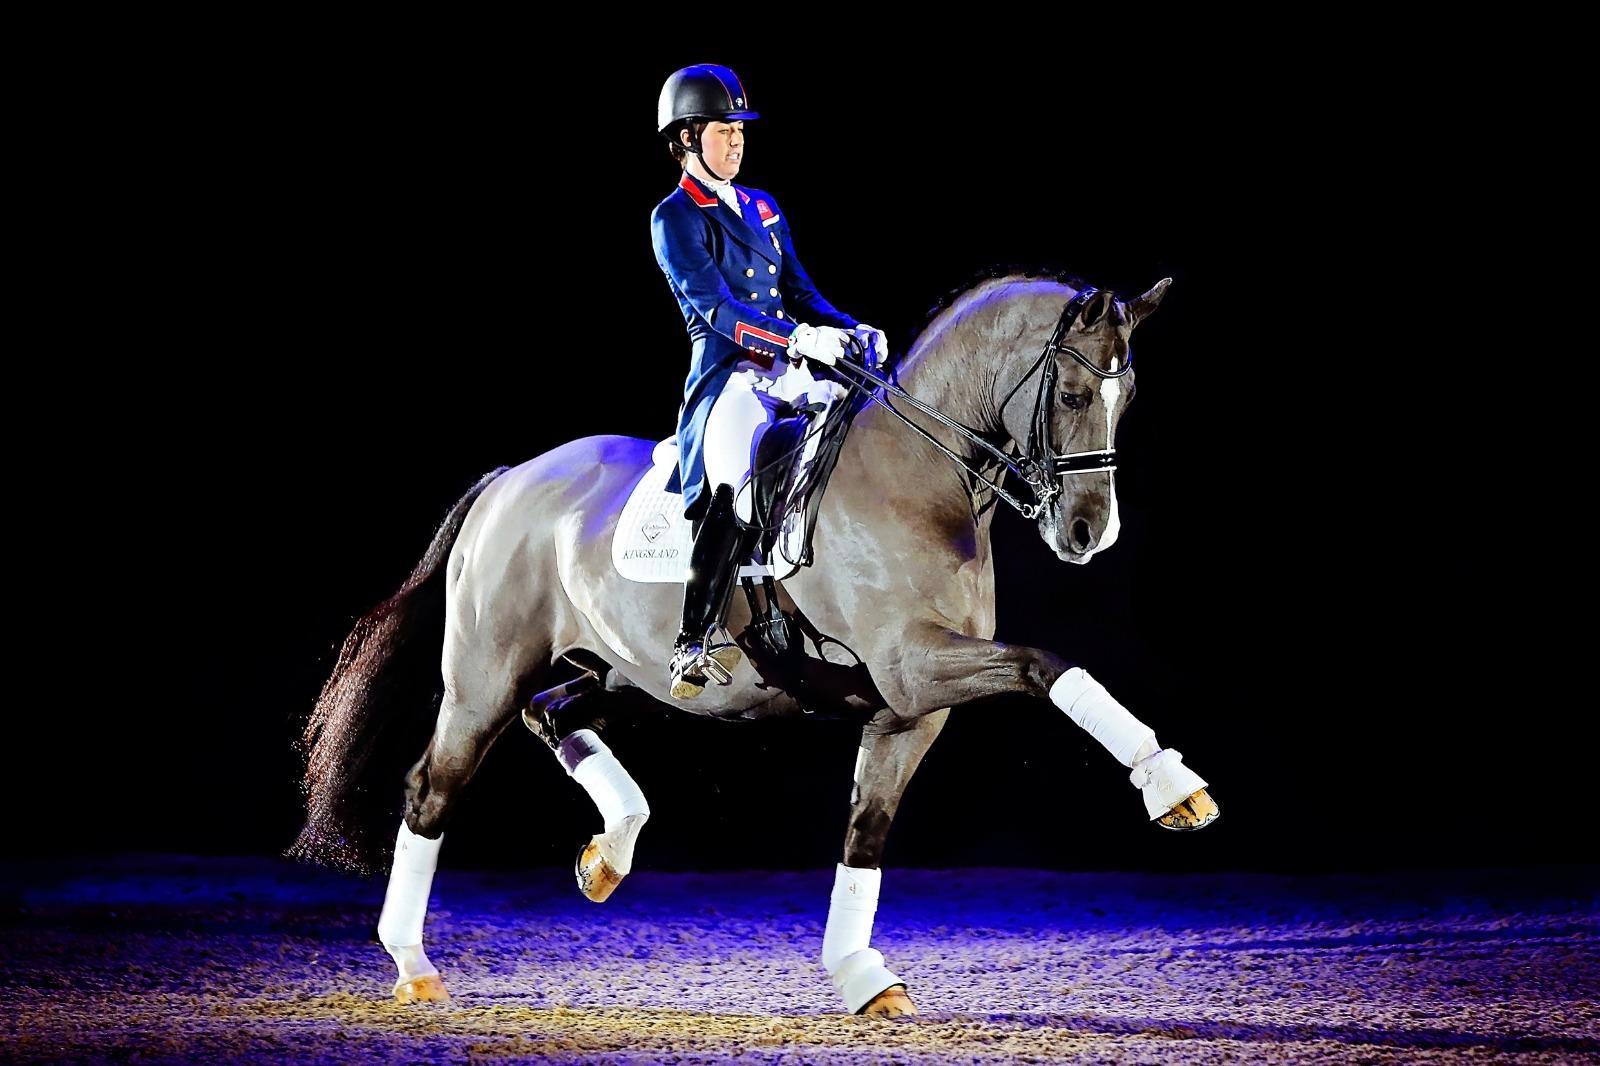 Valegro dirige-se ao Liverpool International Horse Show 2